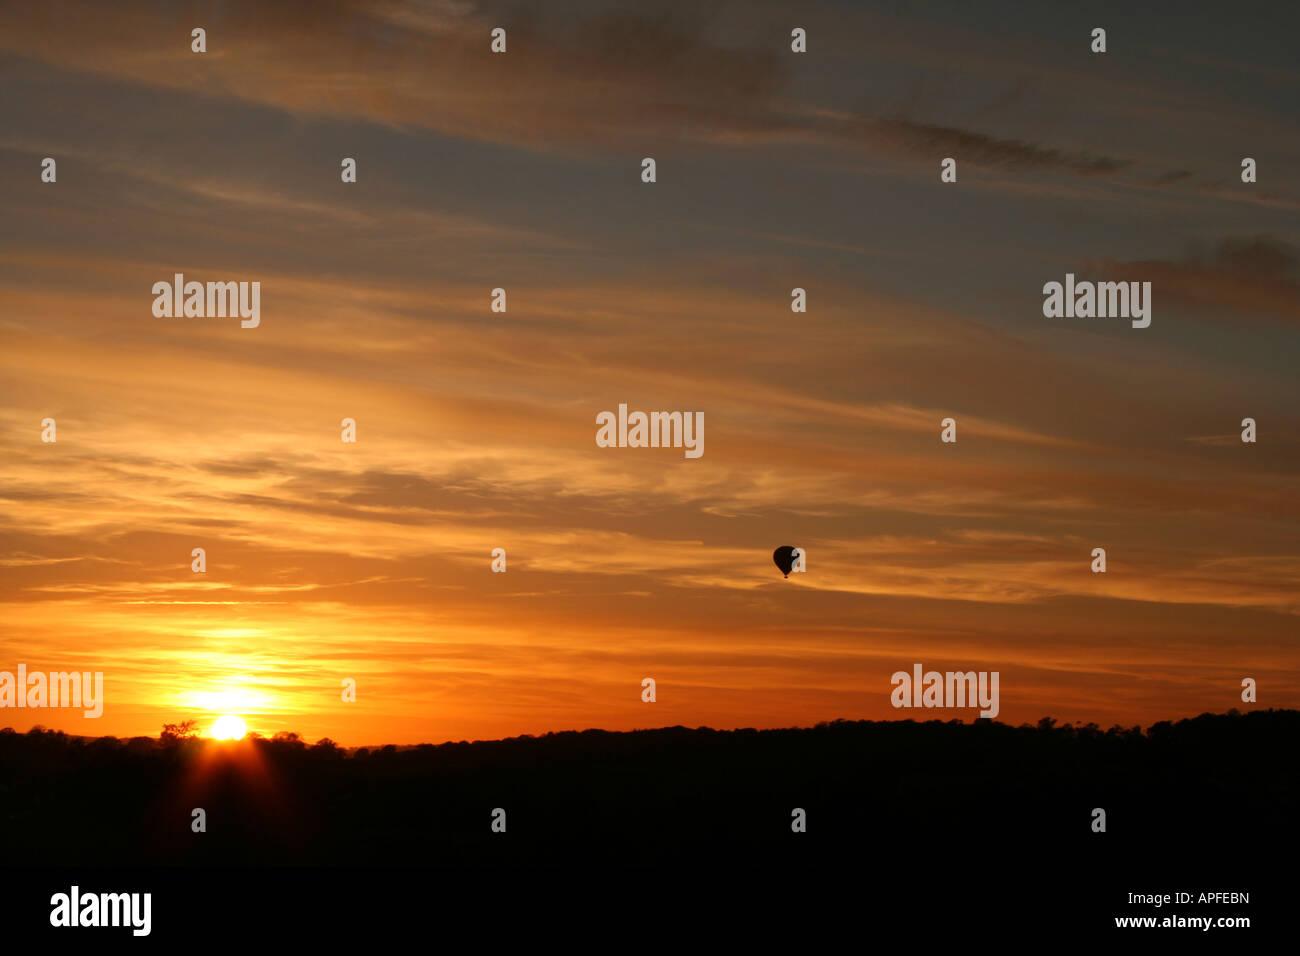 Baloon into sunset - Stock Image